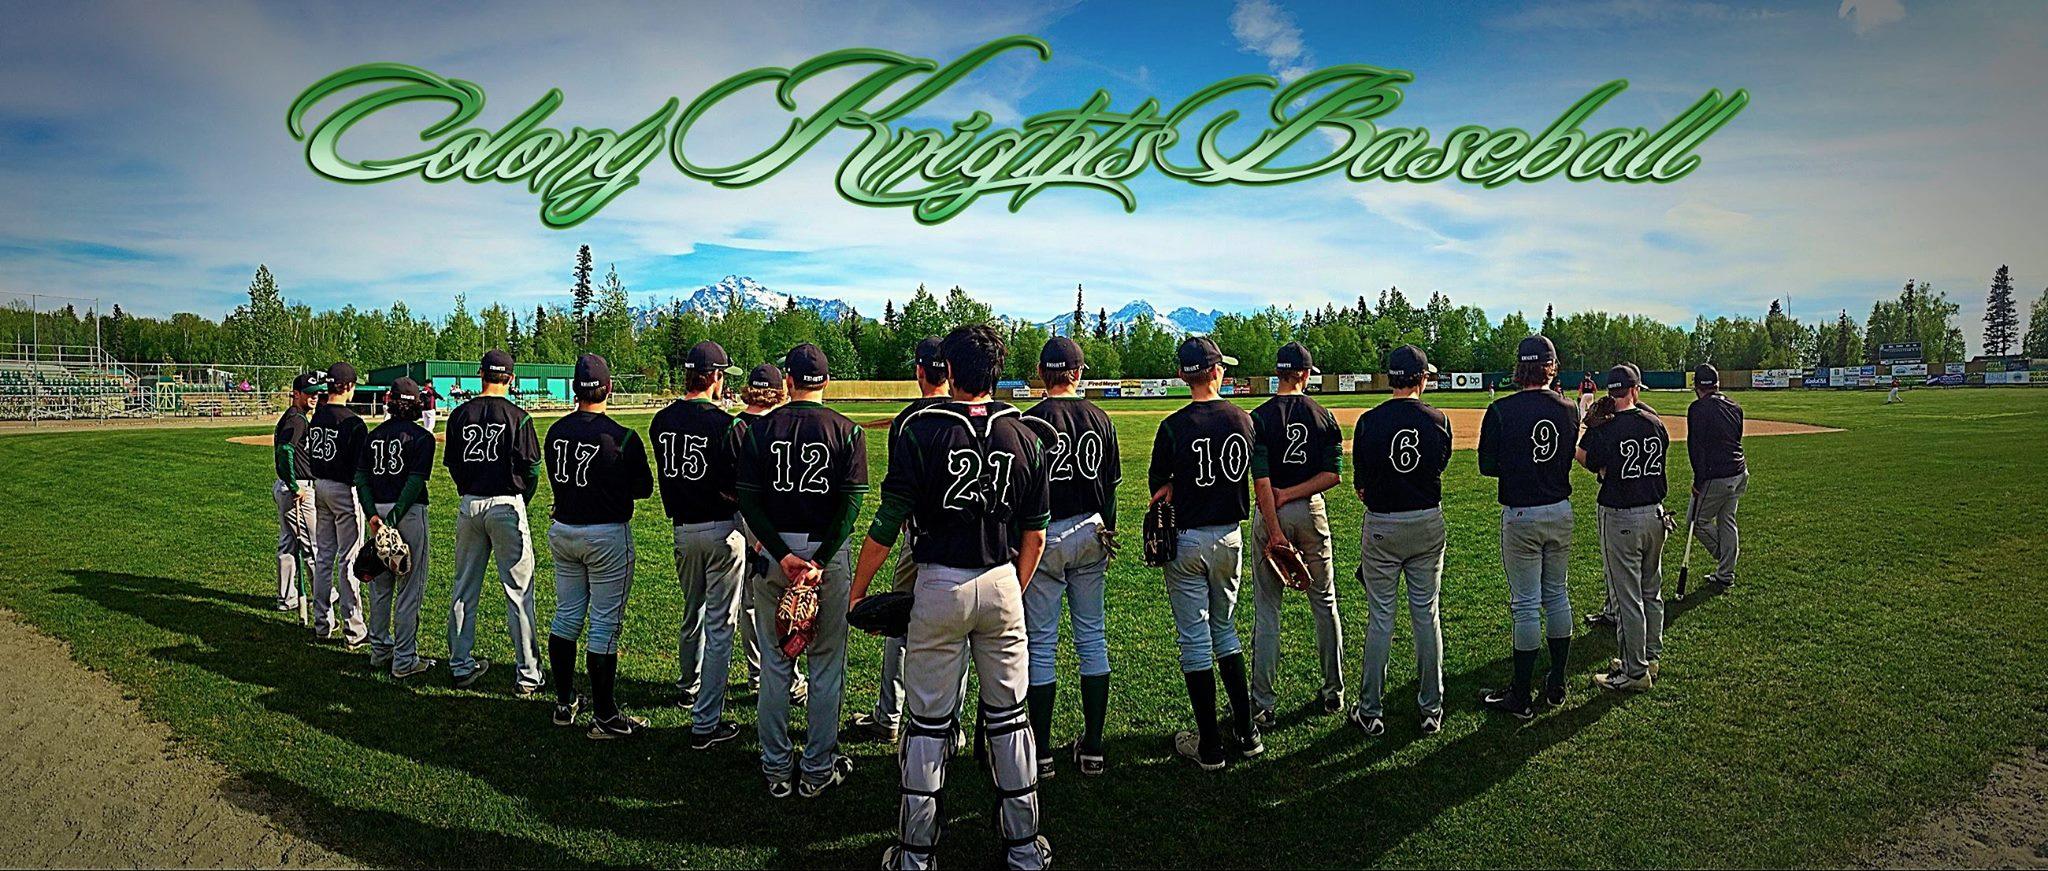 Colonyknightsbaseball Home Page